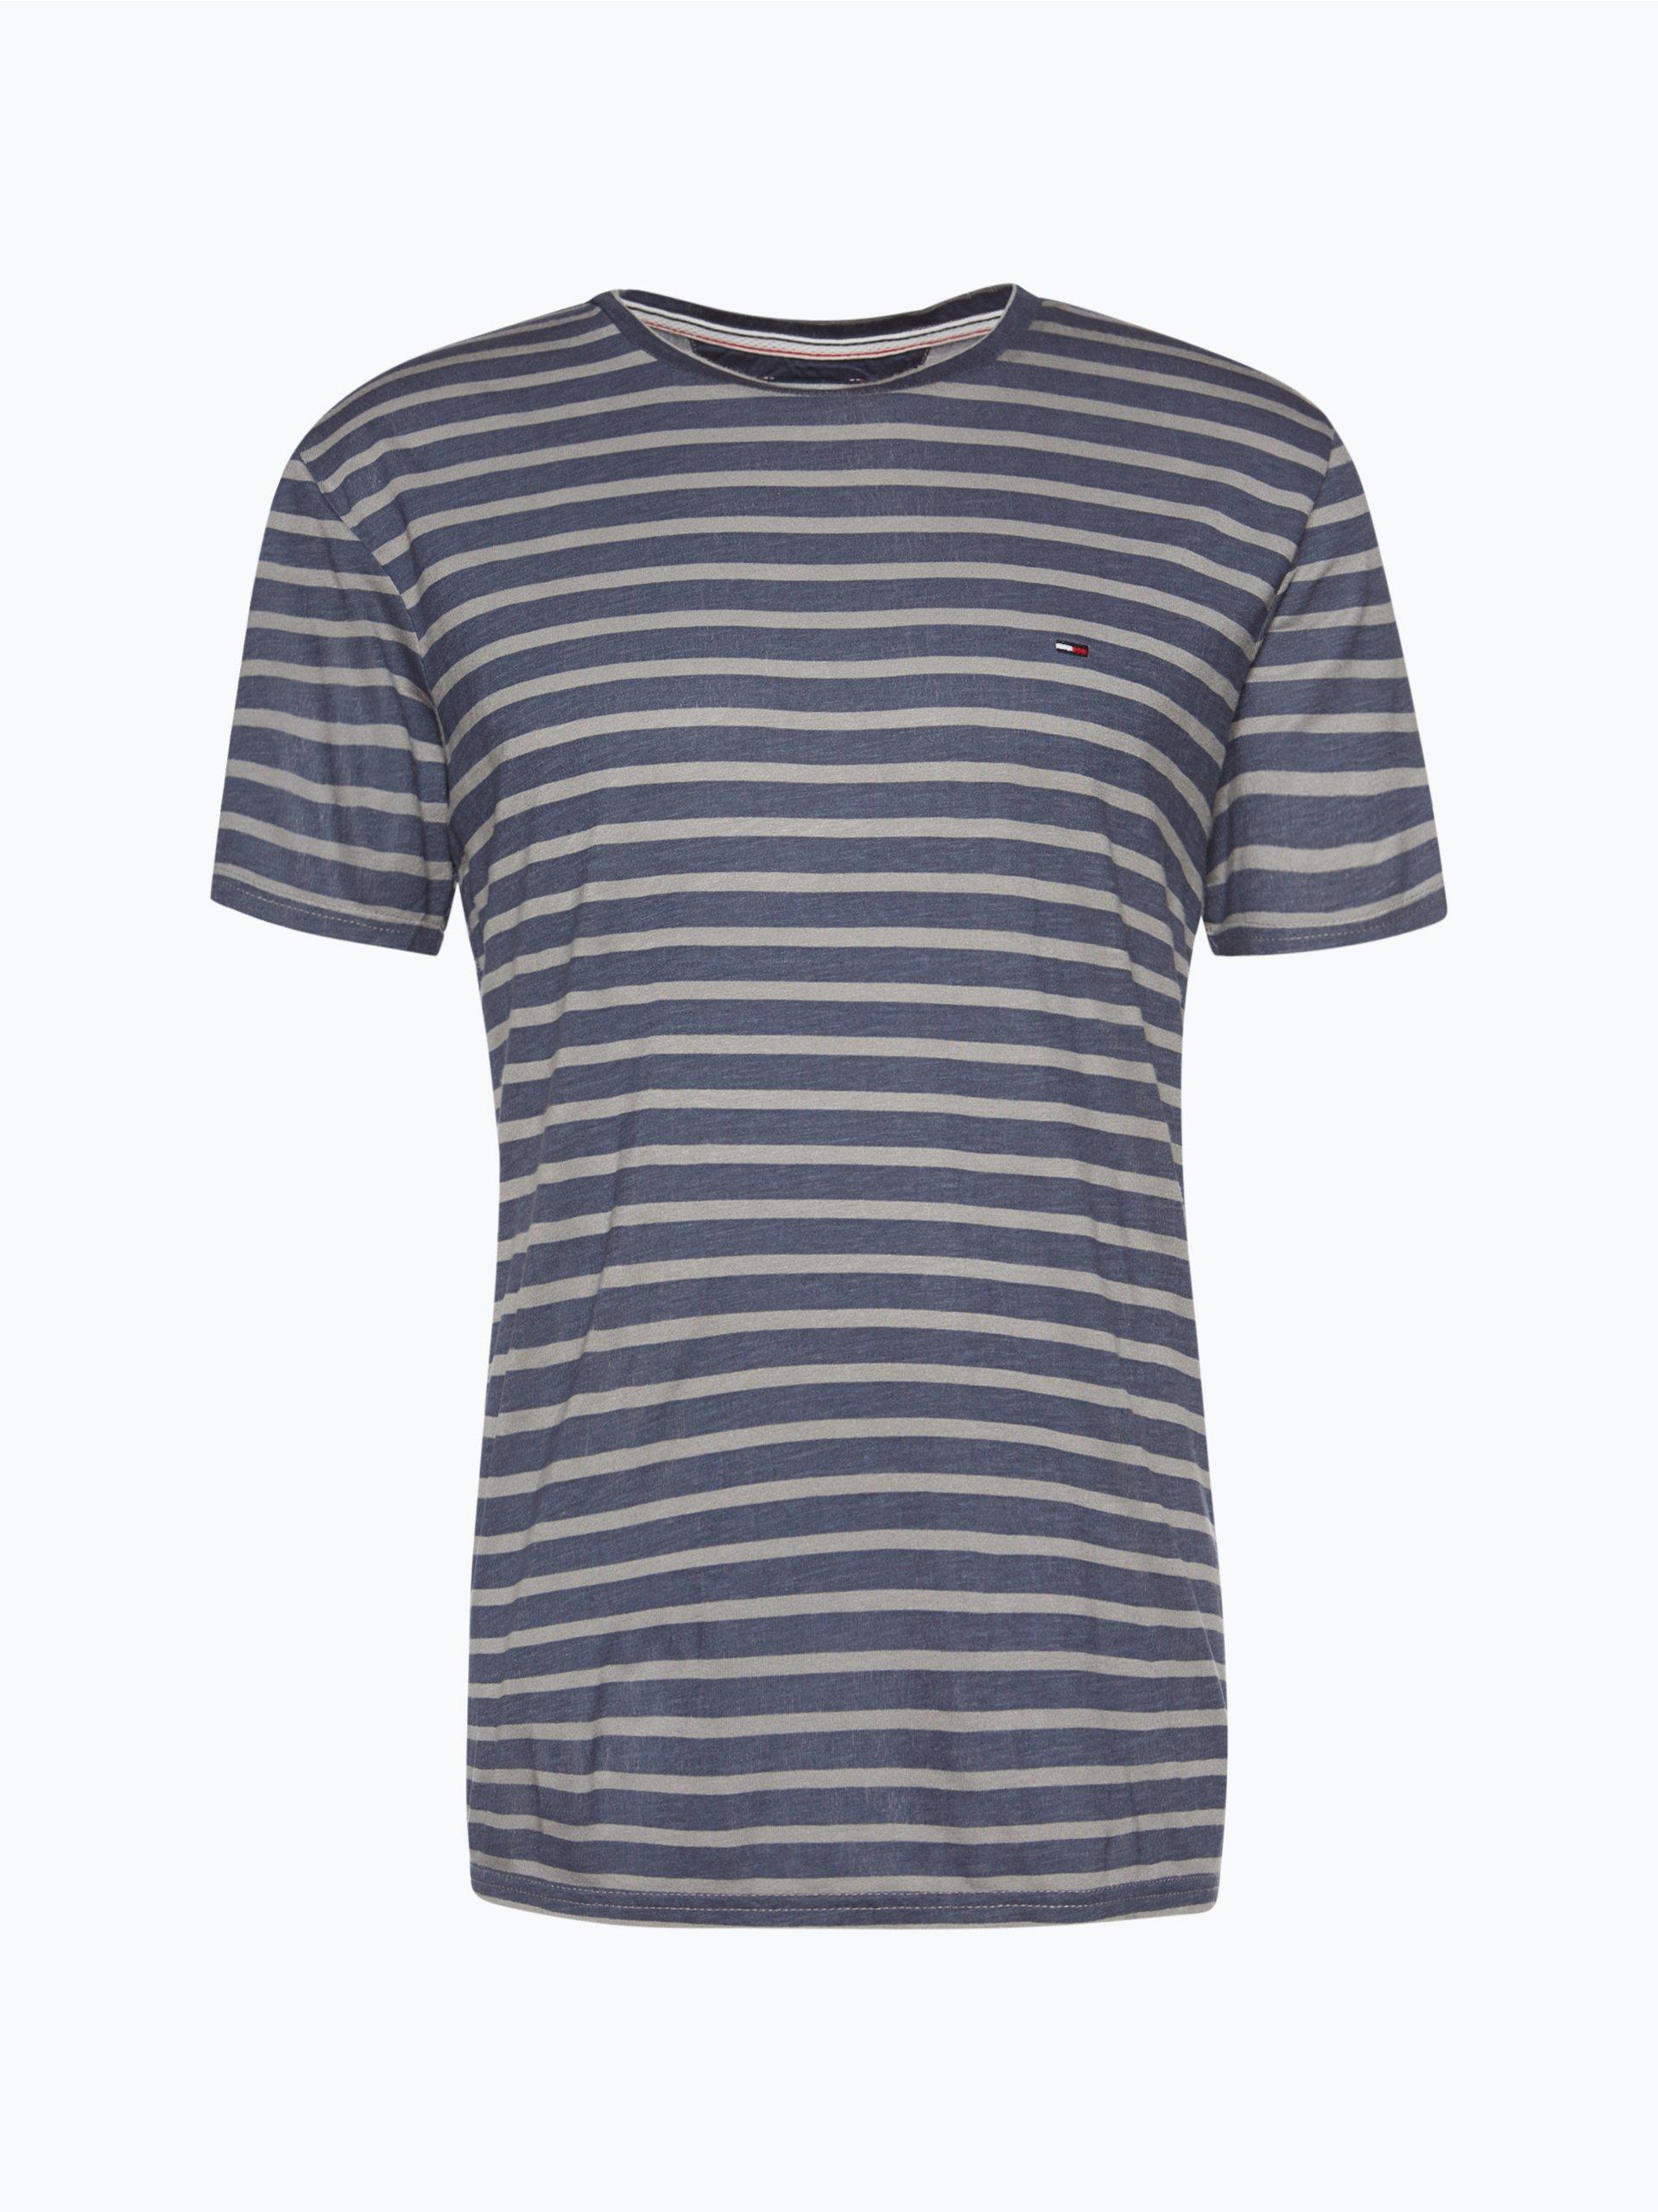 tommy jeans herren t shirt grau gestreift online kaufen. Black Bedroom Furniture Sets. Home Design Ideas